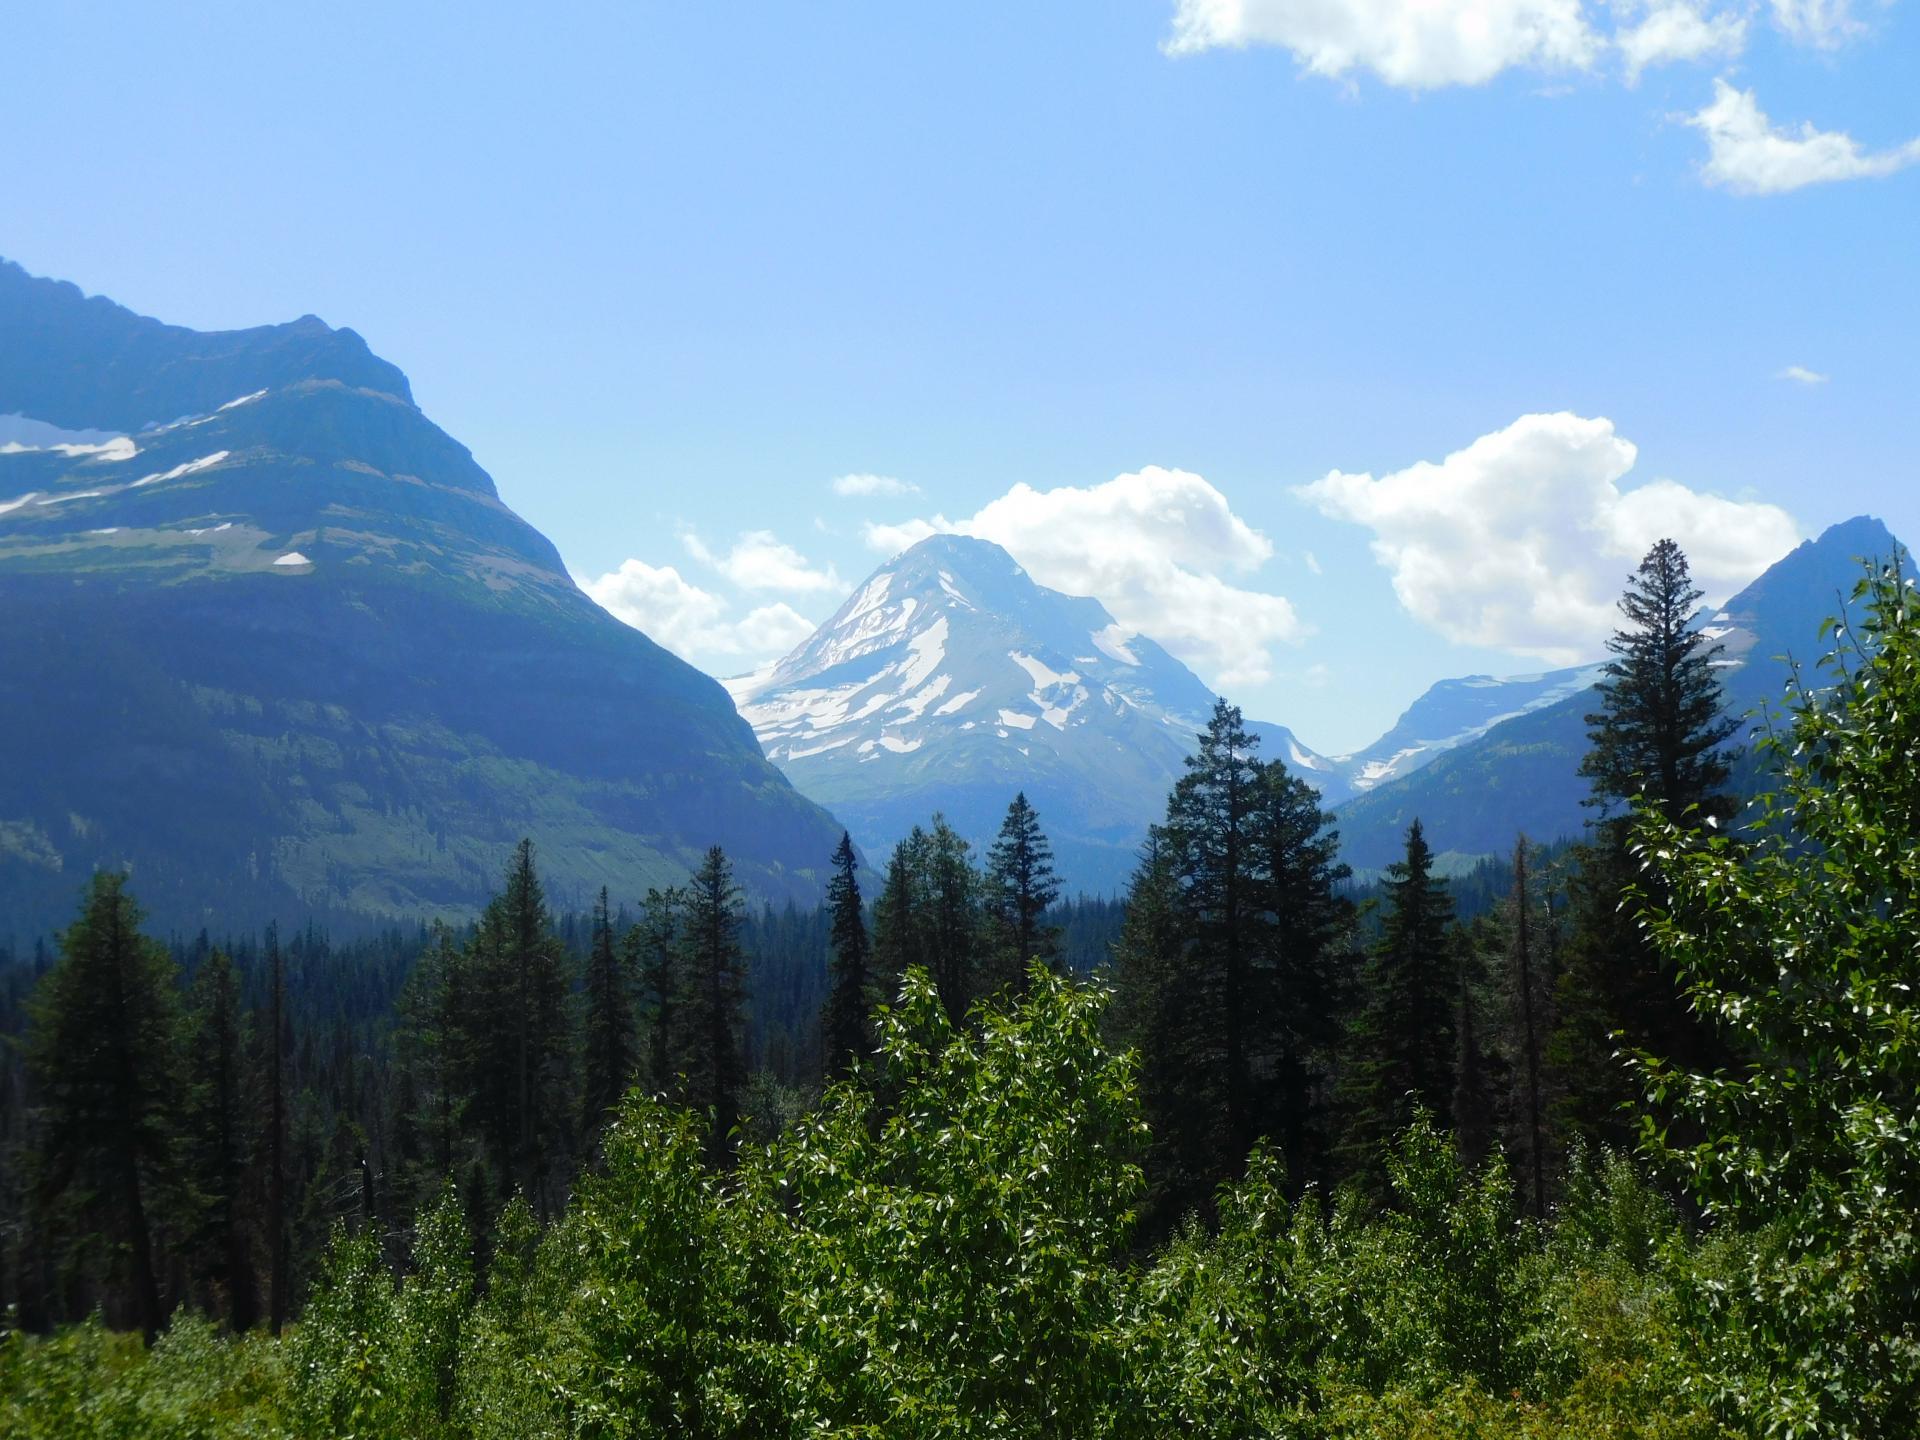 De Rocky Mountains ontdekken in de USA en Canada